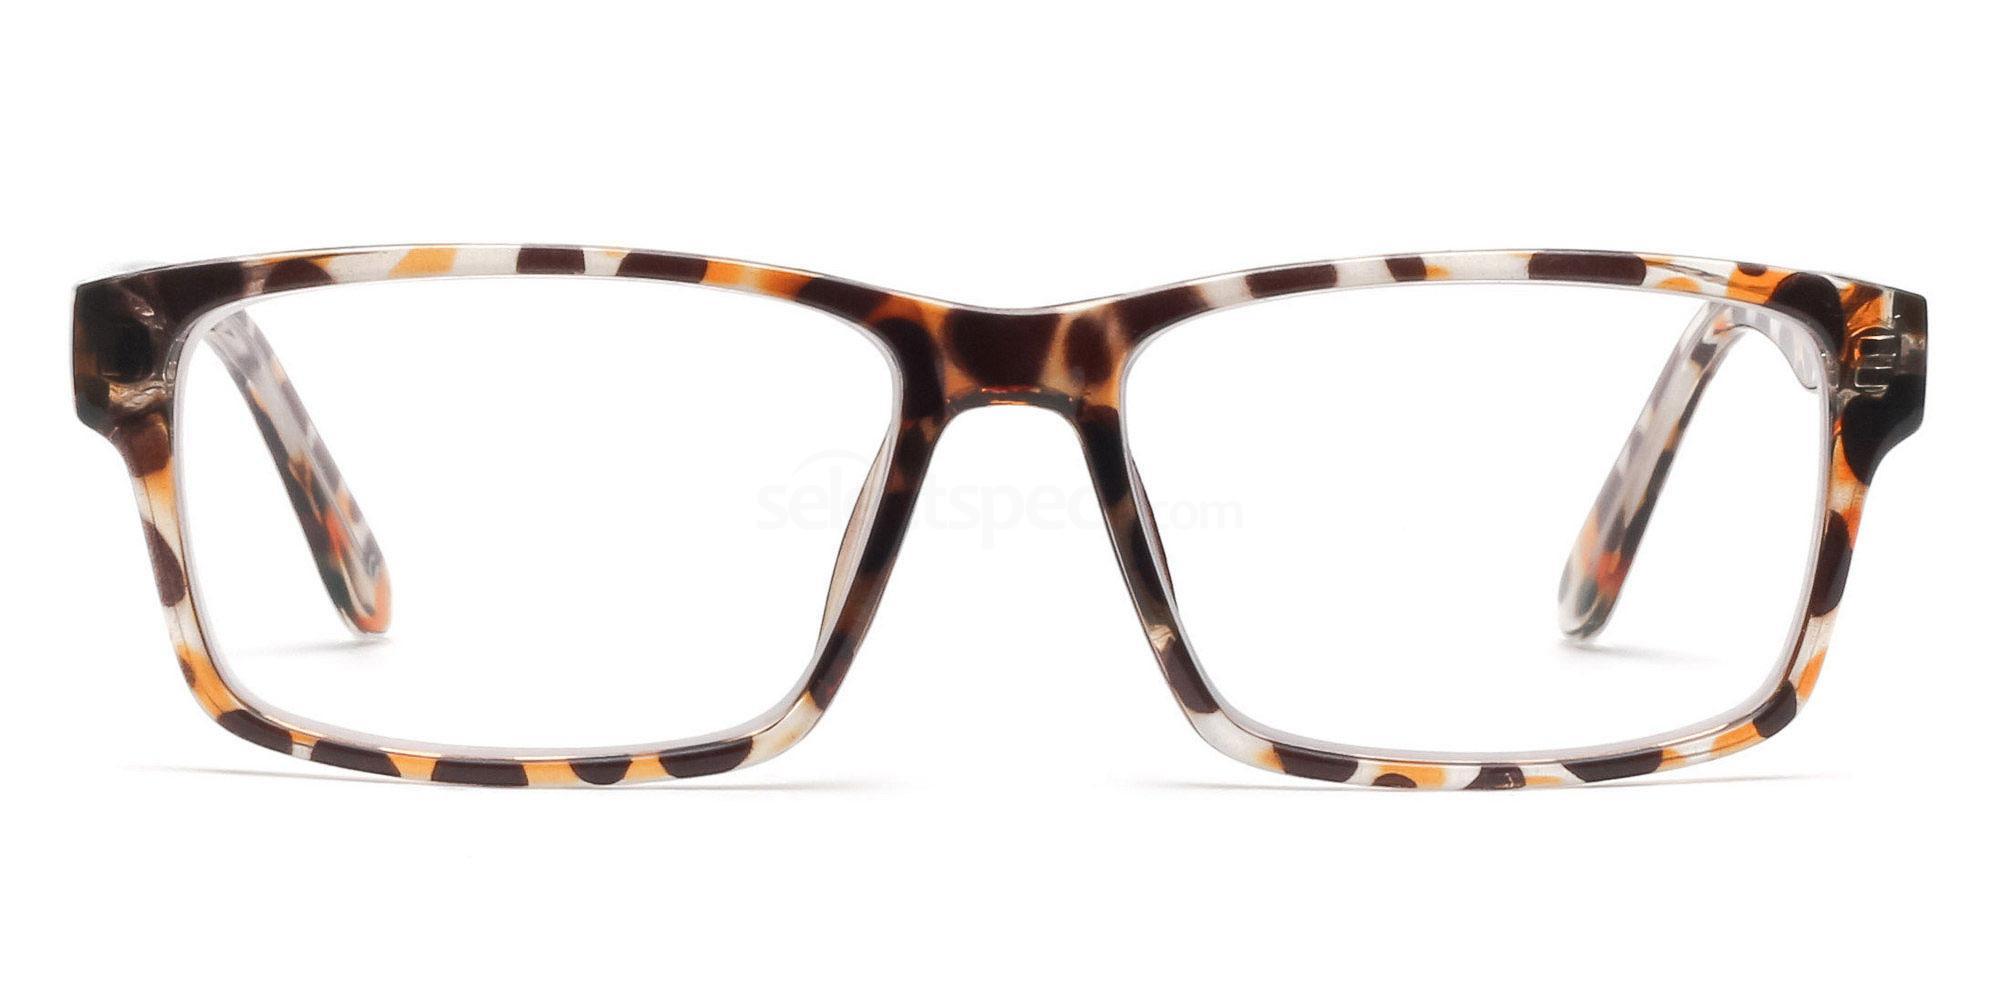 COL.06 2376 - Animal Print Glasses, Savannah